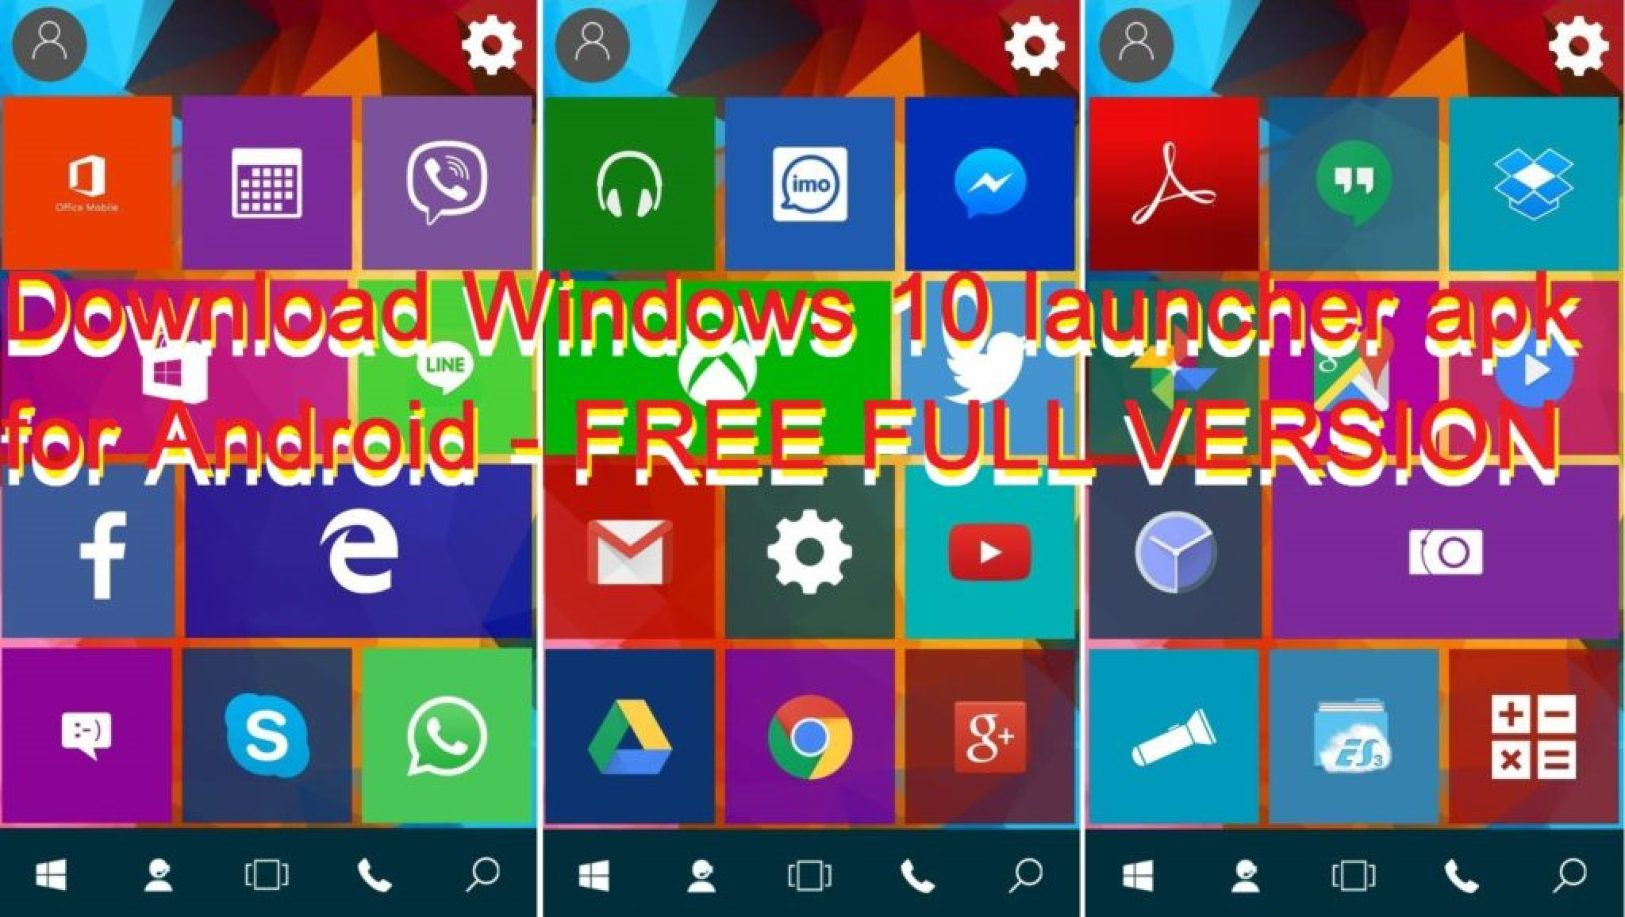 pdf free download full version for windows 10